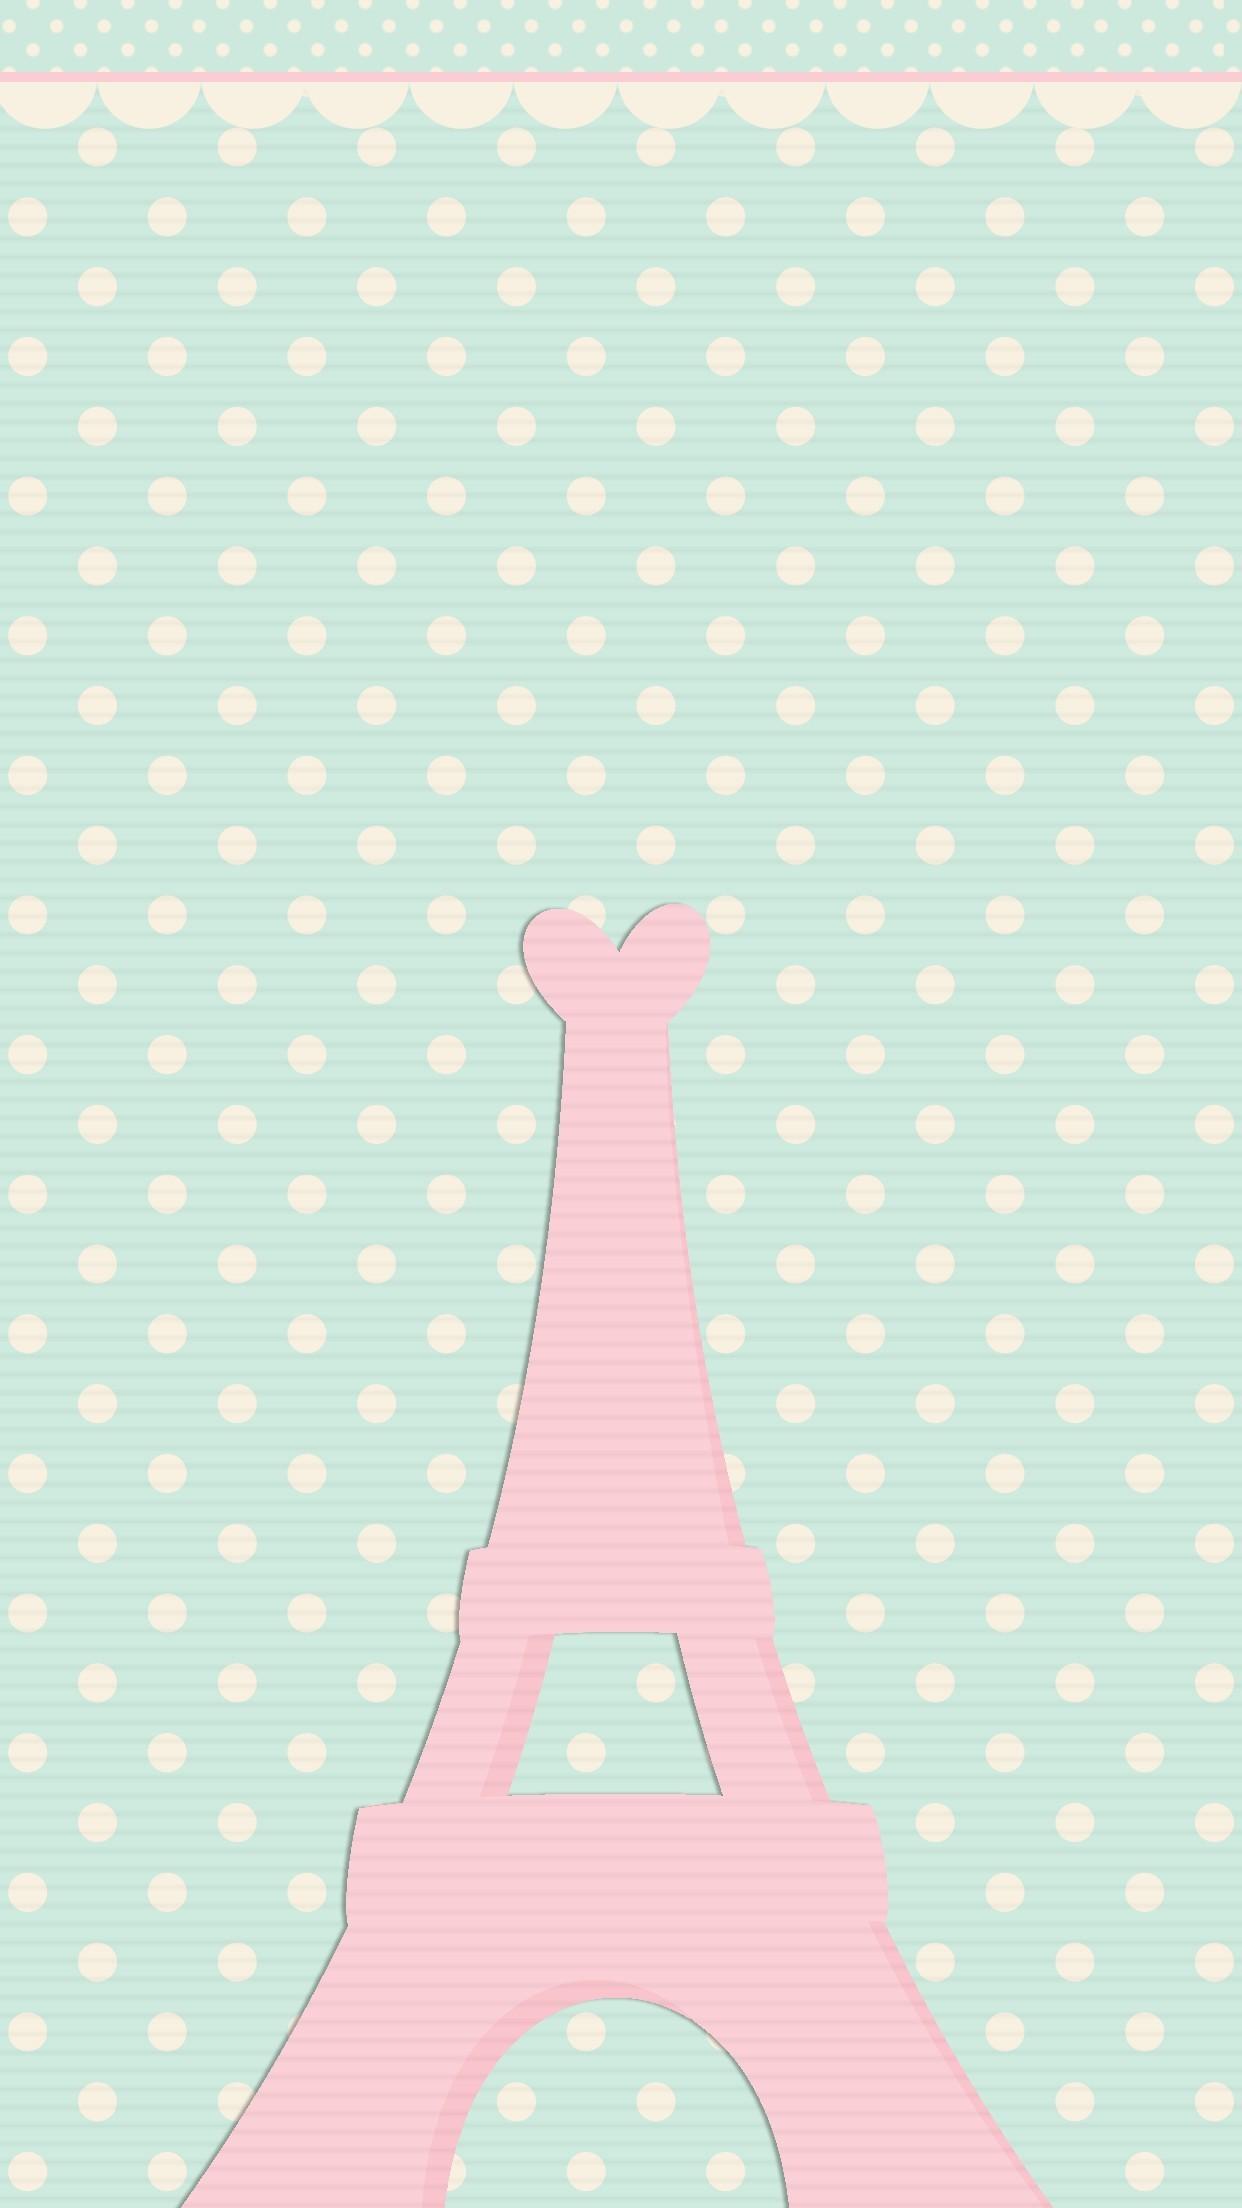 1242x2208 Cute Wallpapers Phone Emo Scene Wallpaper Ideas Backgrounds Pastel Goth Iphone 7 Cartoons Kawaii